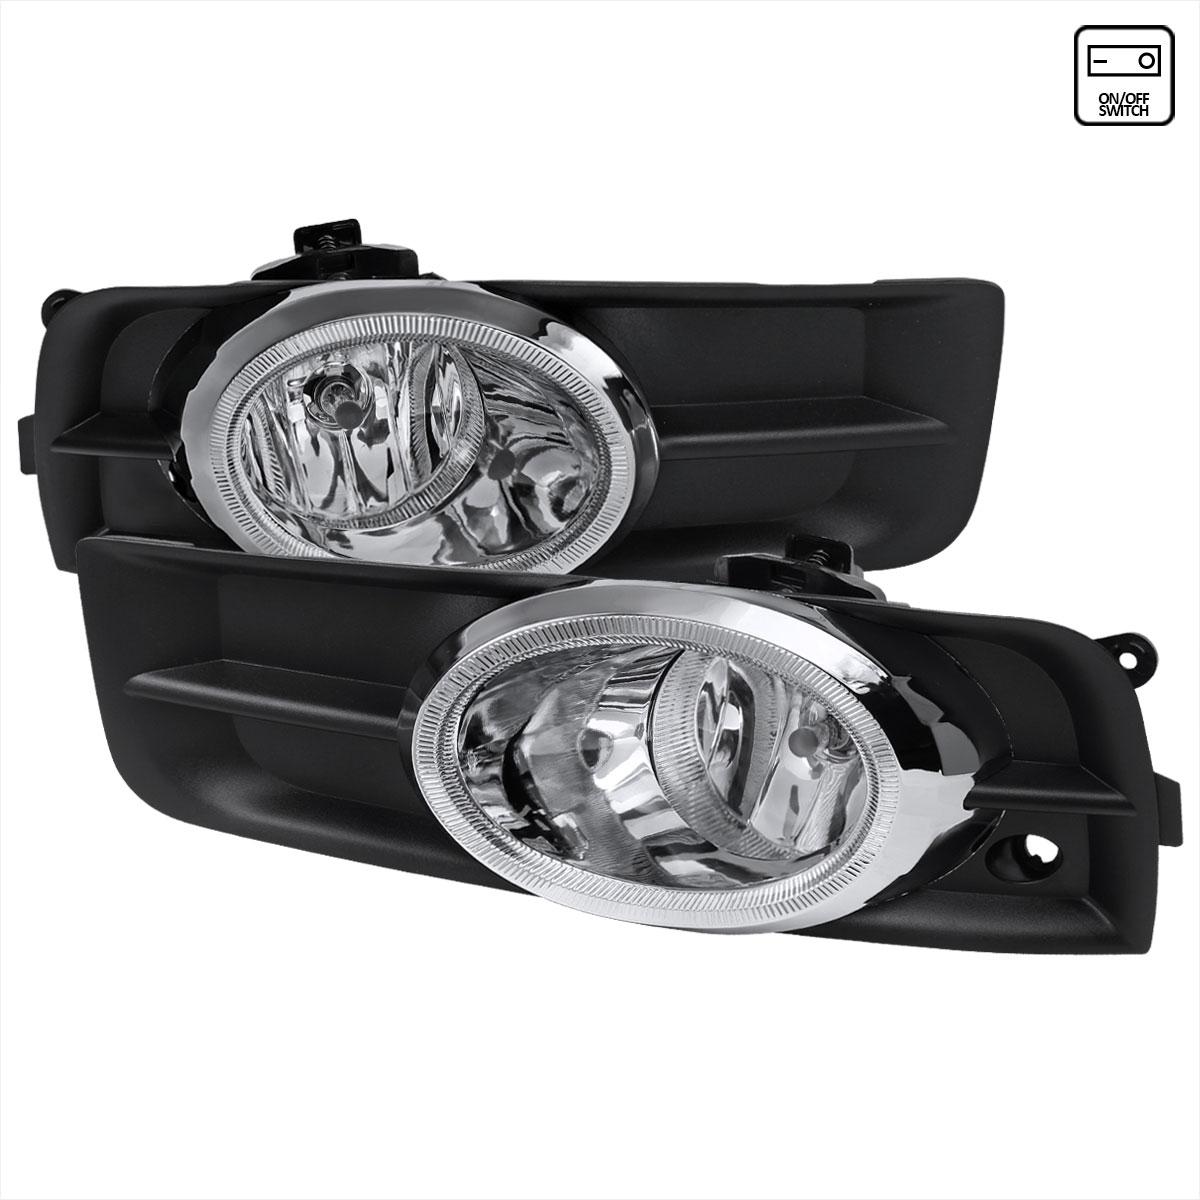 hight resolution of spec d tuning lf cru09coem v2 dl chevrolet cruze clear foglights with wiring kit 2011 2014